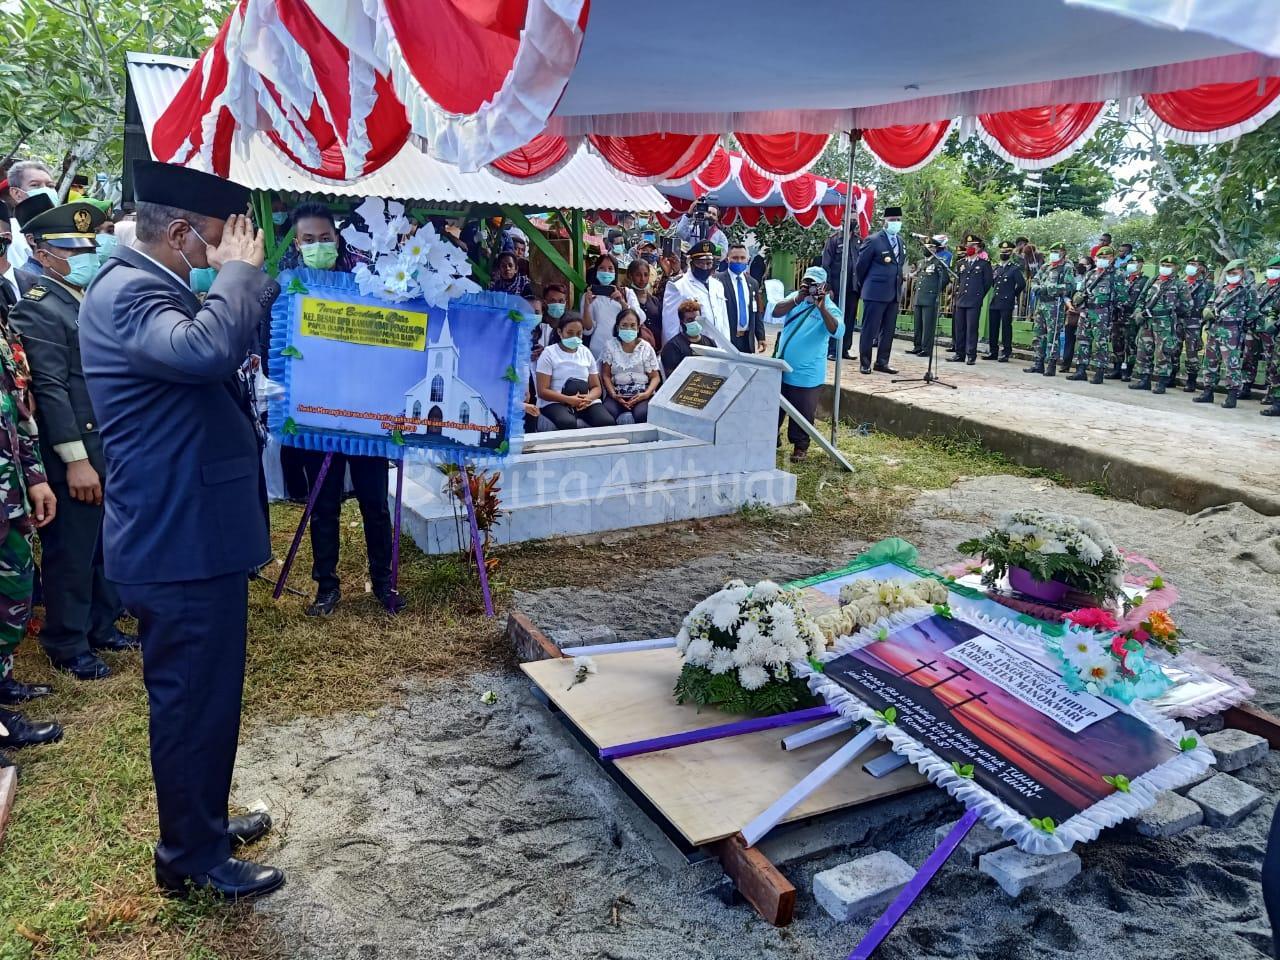 Gubernur PB, Pimpin Pemakaman Alm. Bupati Manokwari Demas Paulus Mandacan 2 IMG 20200423 WA0035 1